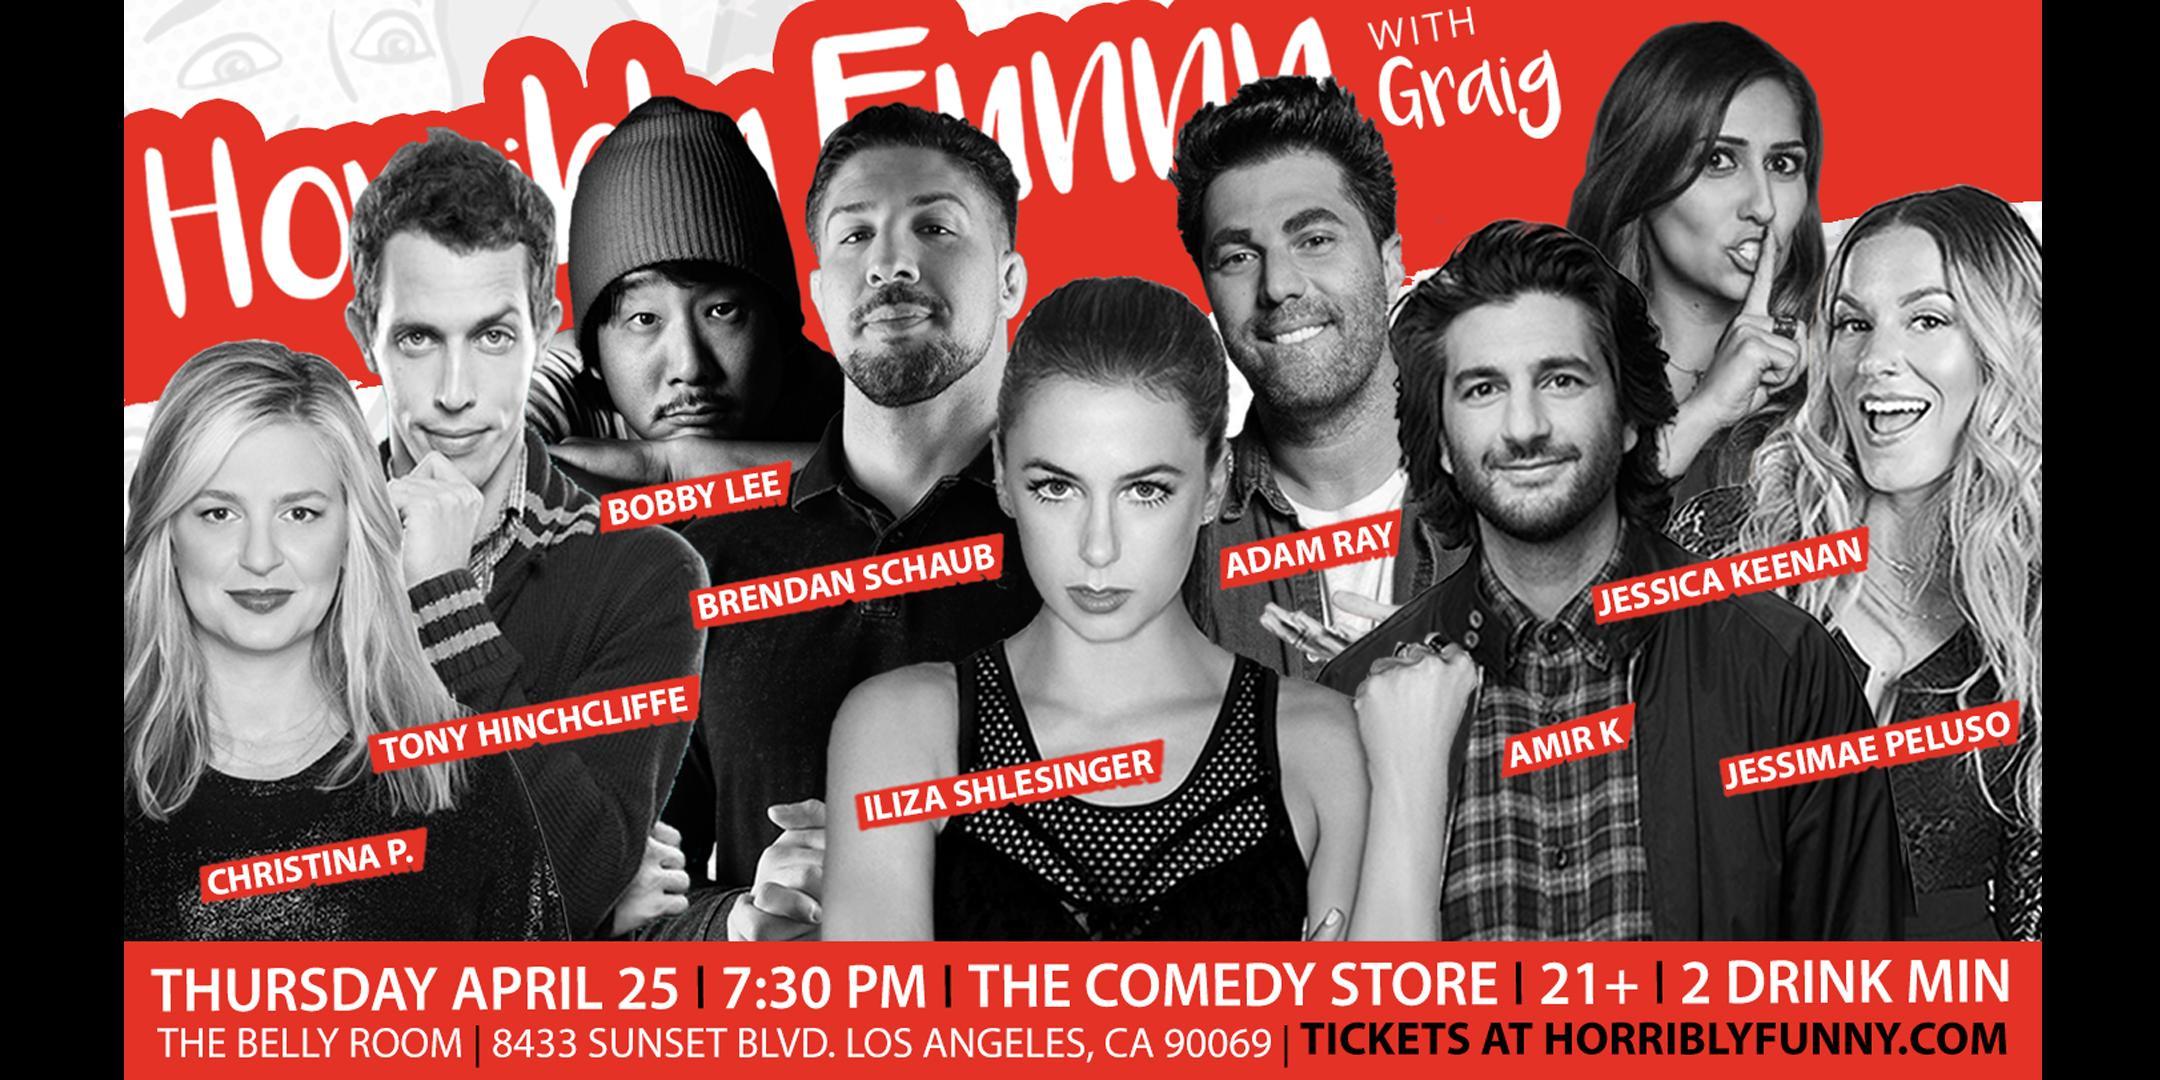 Horribly Funny - Iliza Shlesinger, Bobby Lee, Brendan Schaub, Christina P.